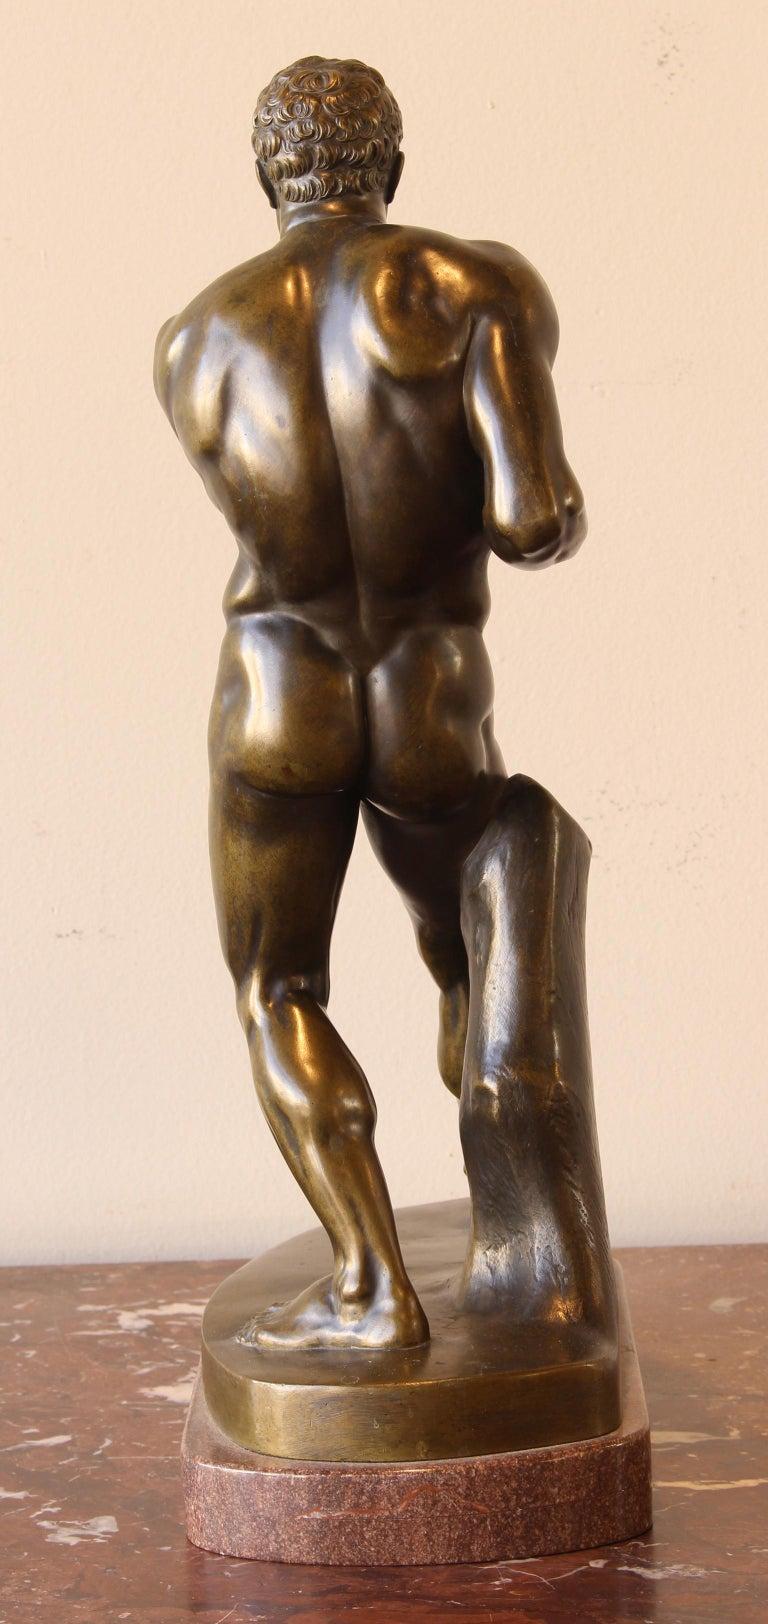 Large and Impressive Mid-19th Century Italian School Bronze Sculpture In Excellent Condition For Sale In Kilmarnock, VA